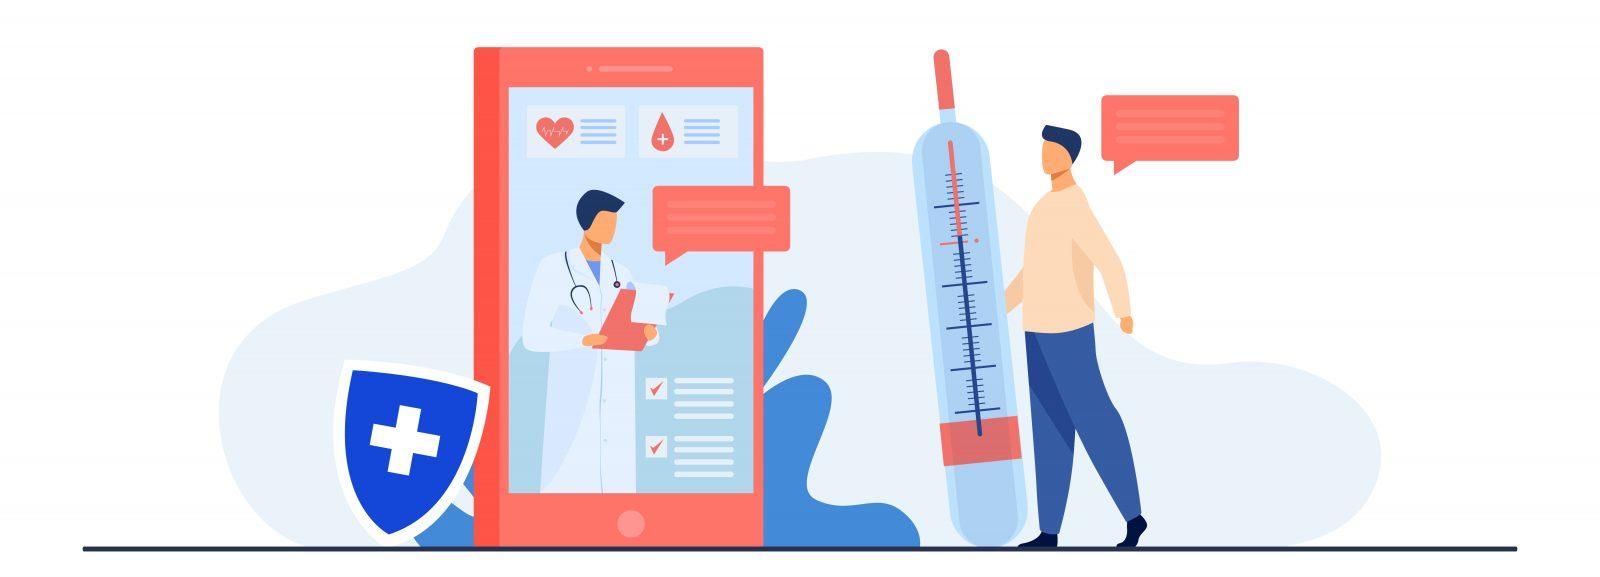 Telemedicina permanecerá post pandemia